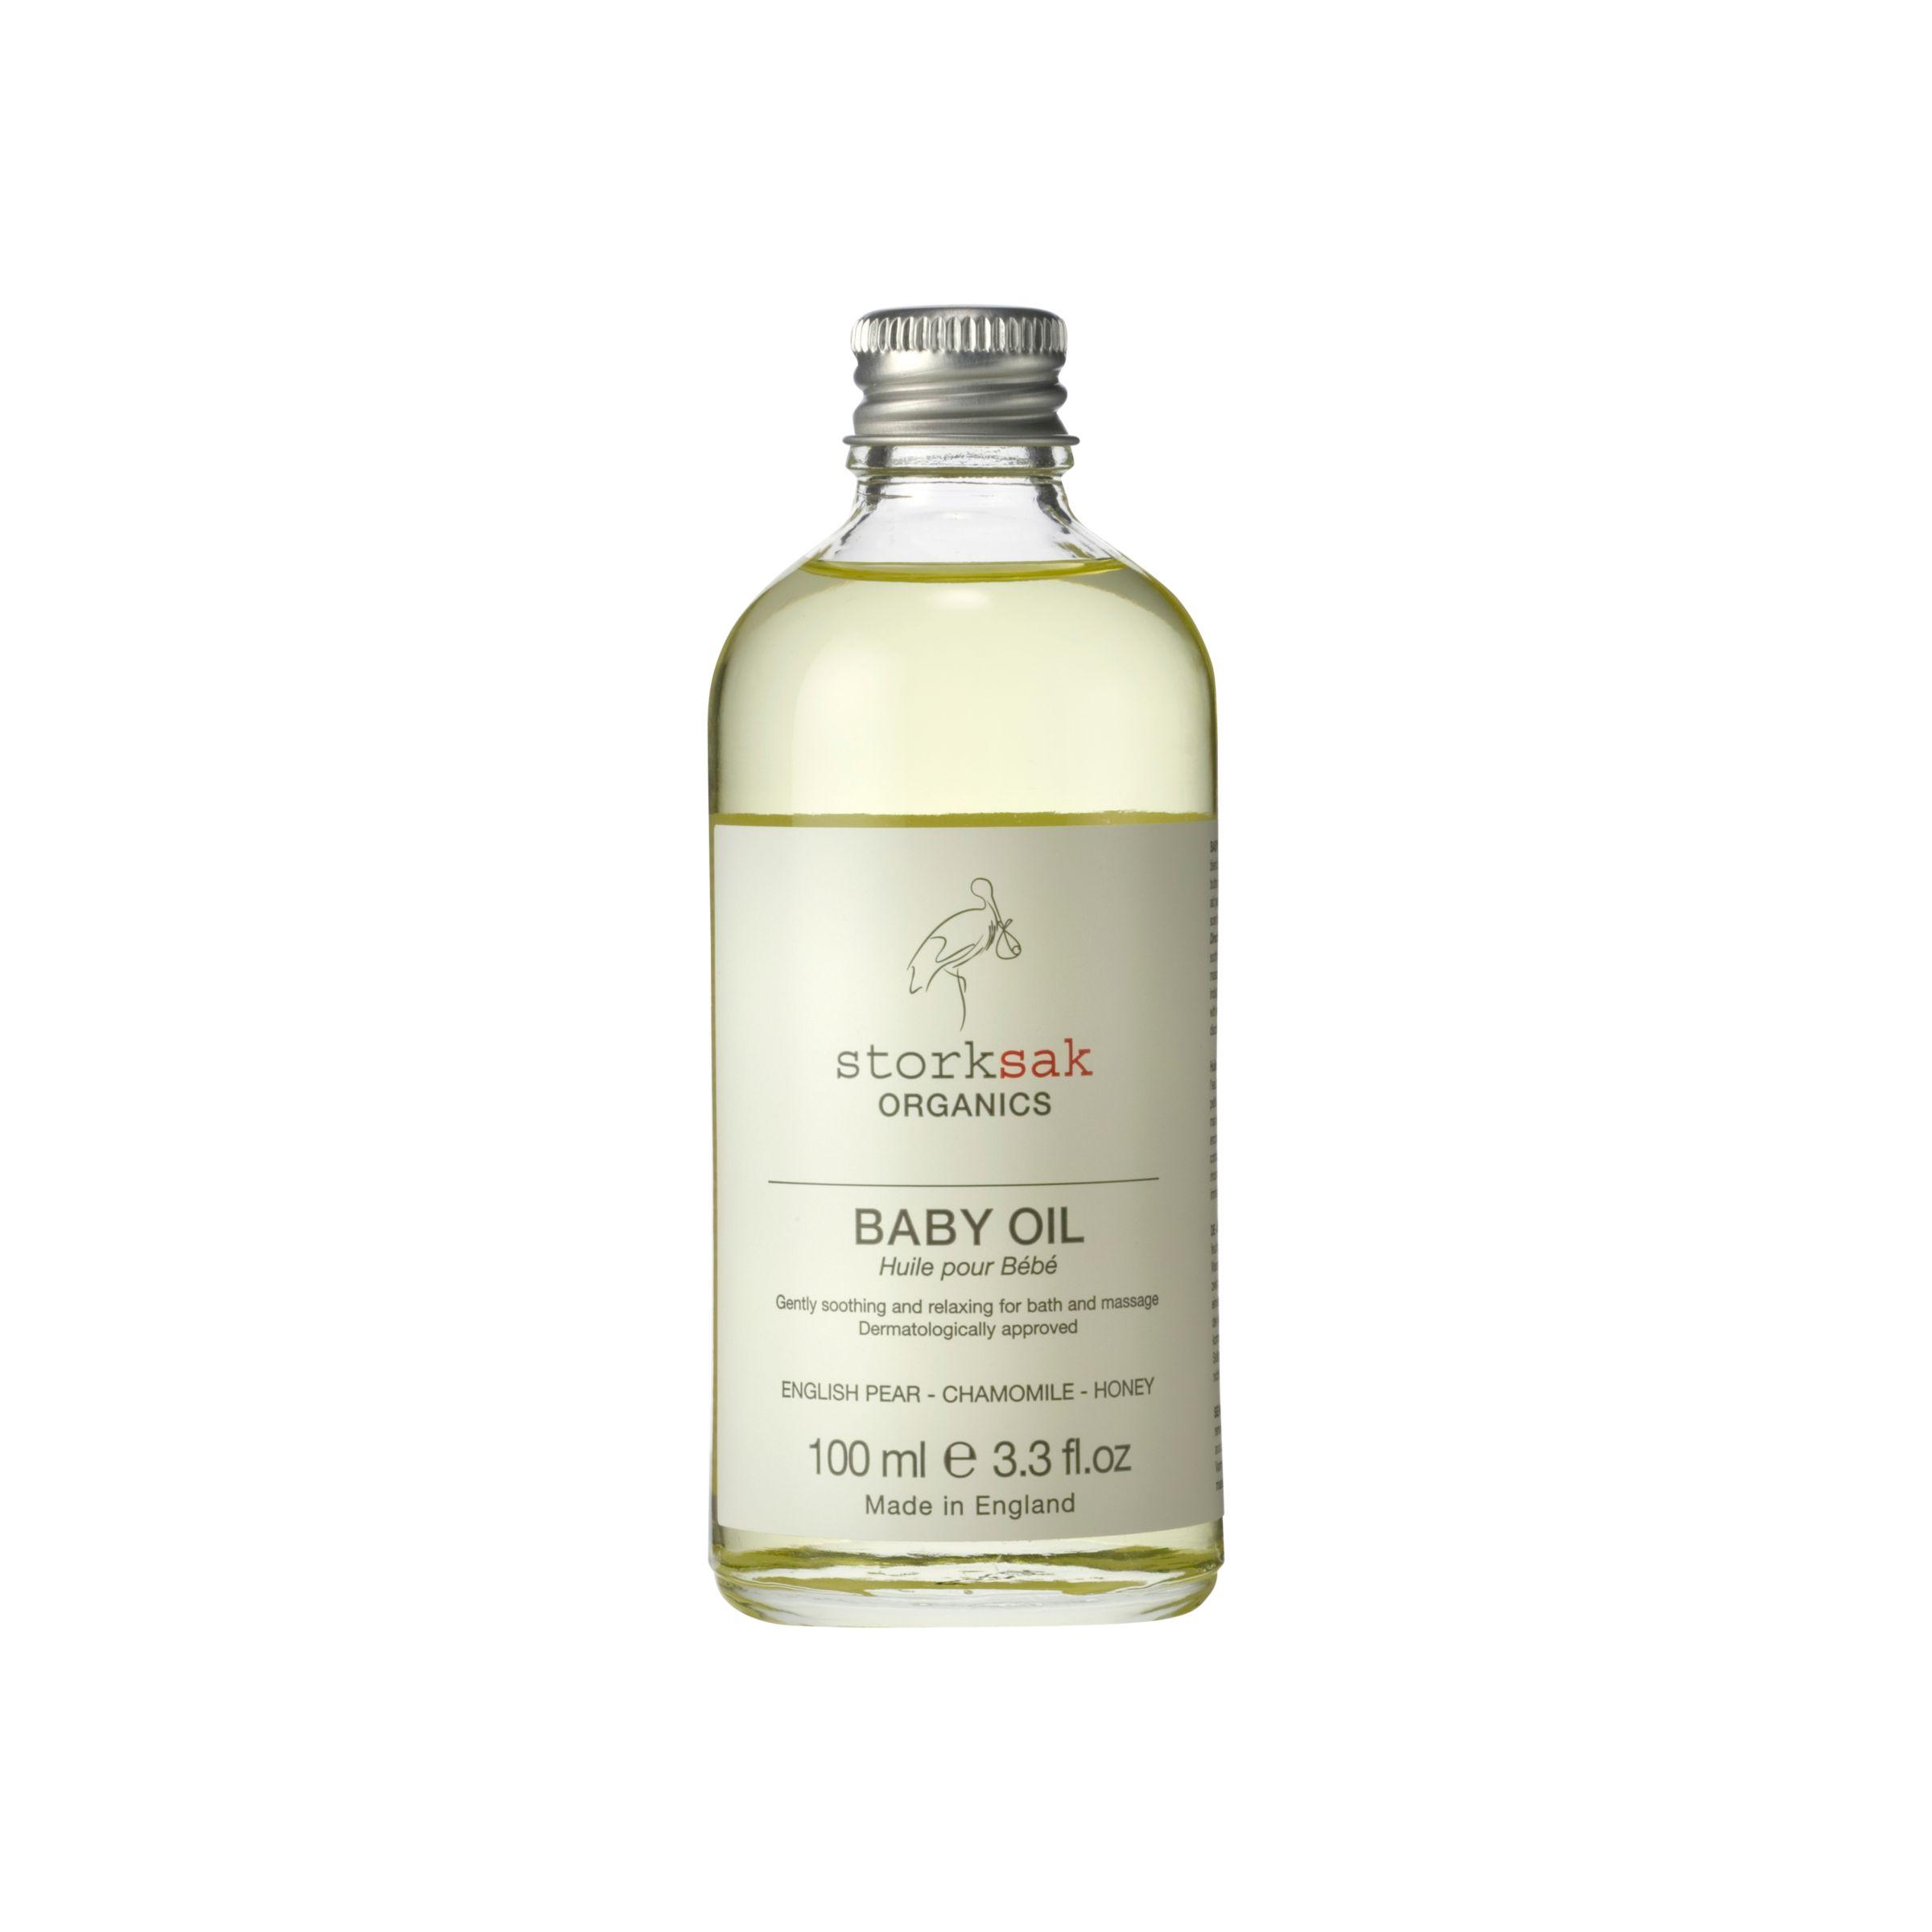 Storksak Storksak Organics Baby Oil, 100ml